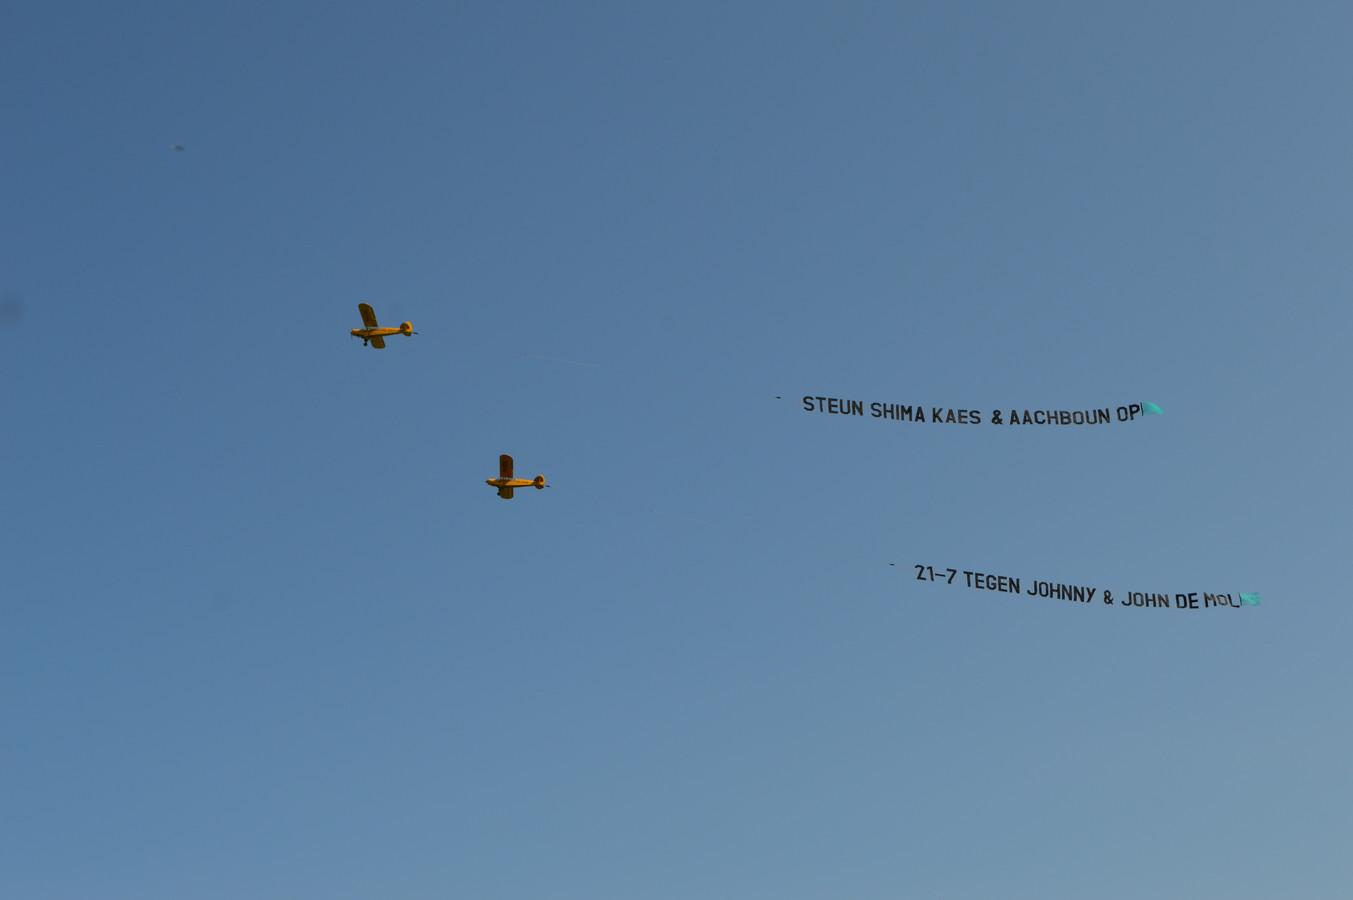 De vliegtuigjes boven Nederland vandaag.